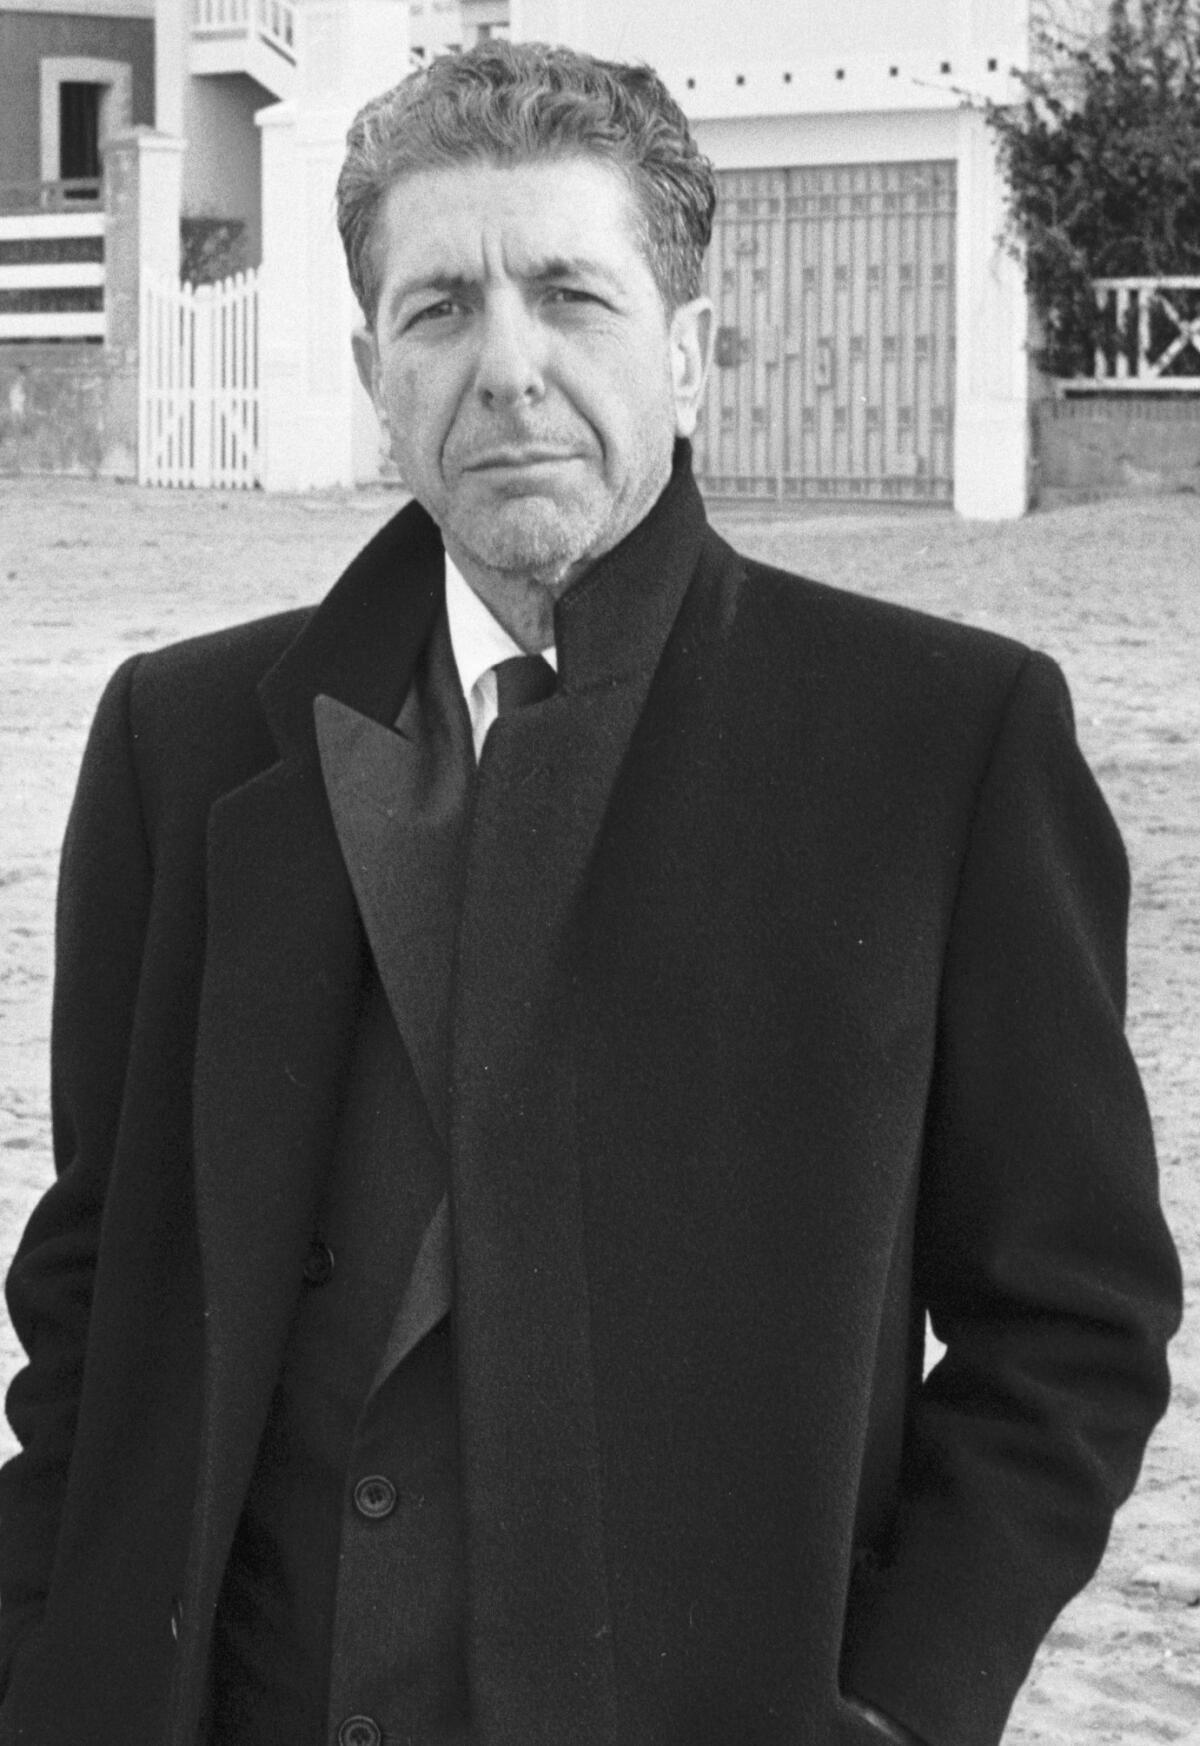 26 января 1988 года. Леонард Коэн в Трувиль-сюр-Мер, Франция